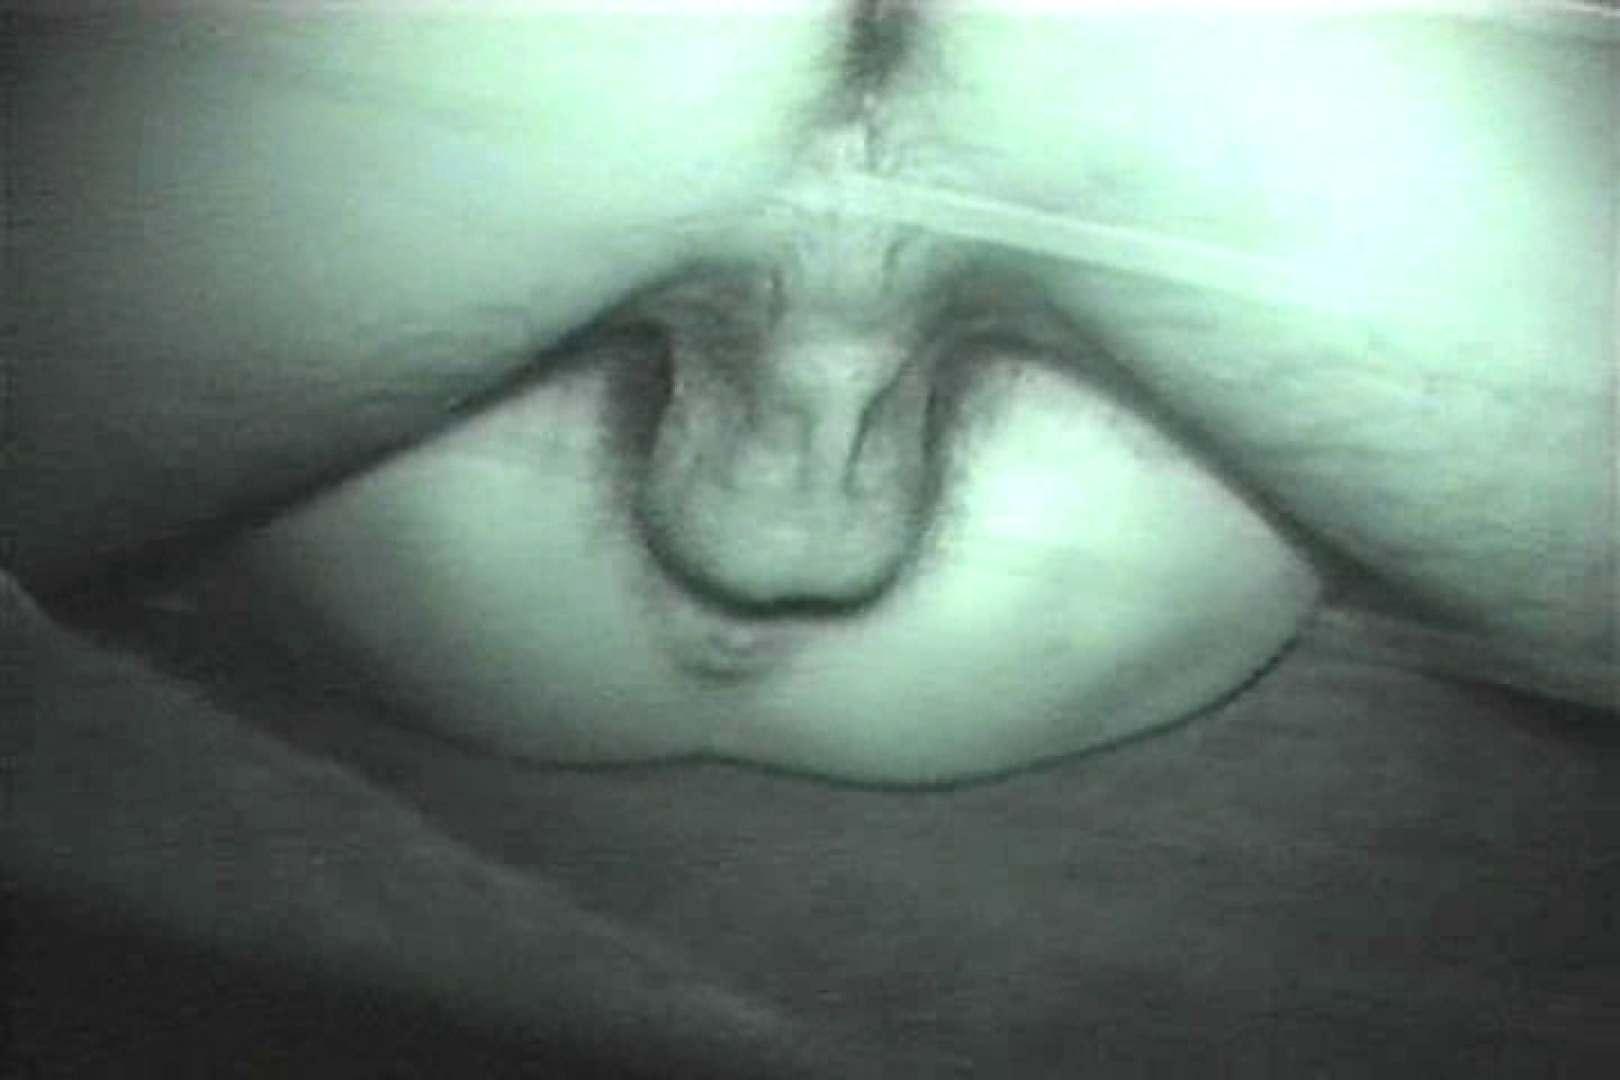 MASAさんの待ち伏せ撮り! 赤外線カーセックスVol.9 カップル セックス画像 74pic 64